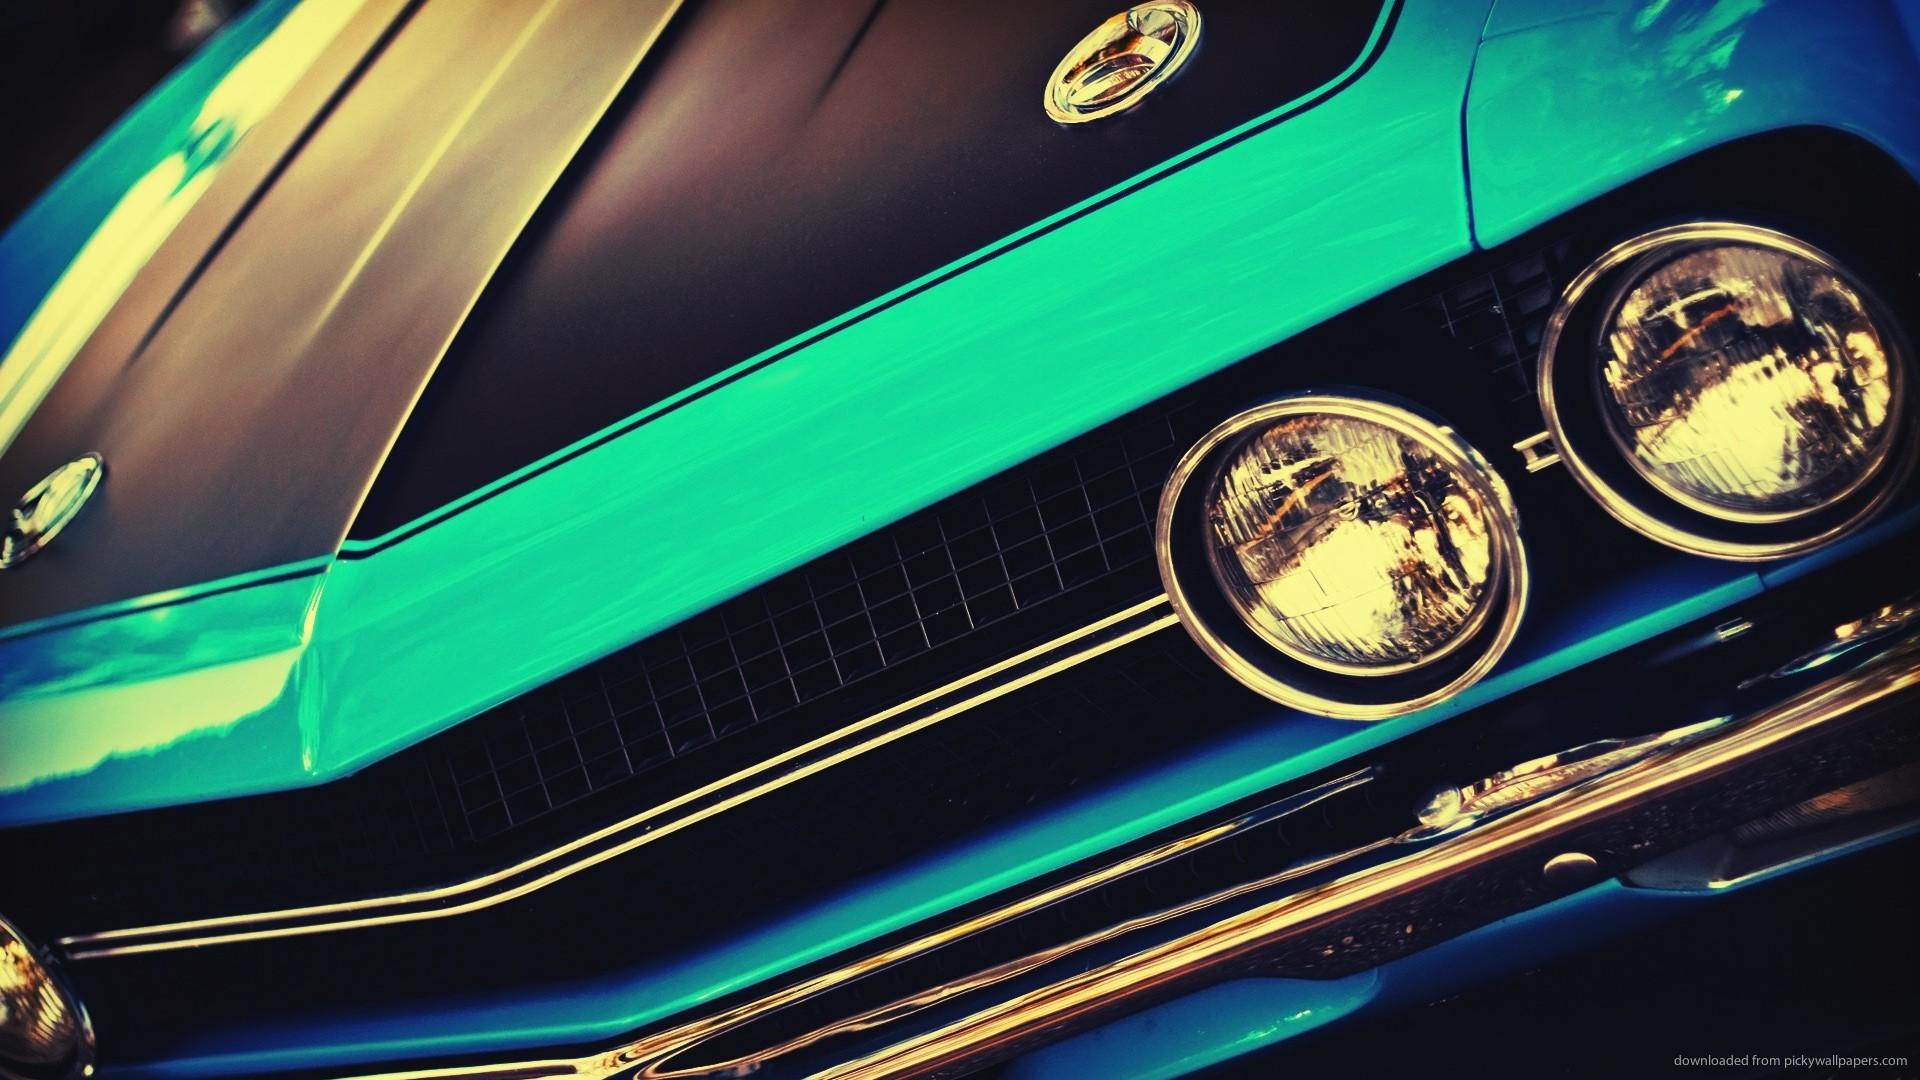 ... com 1920x1080 cars blue vintage muscle car wallpaper download